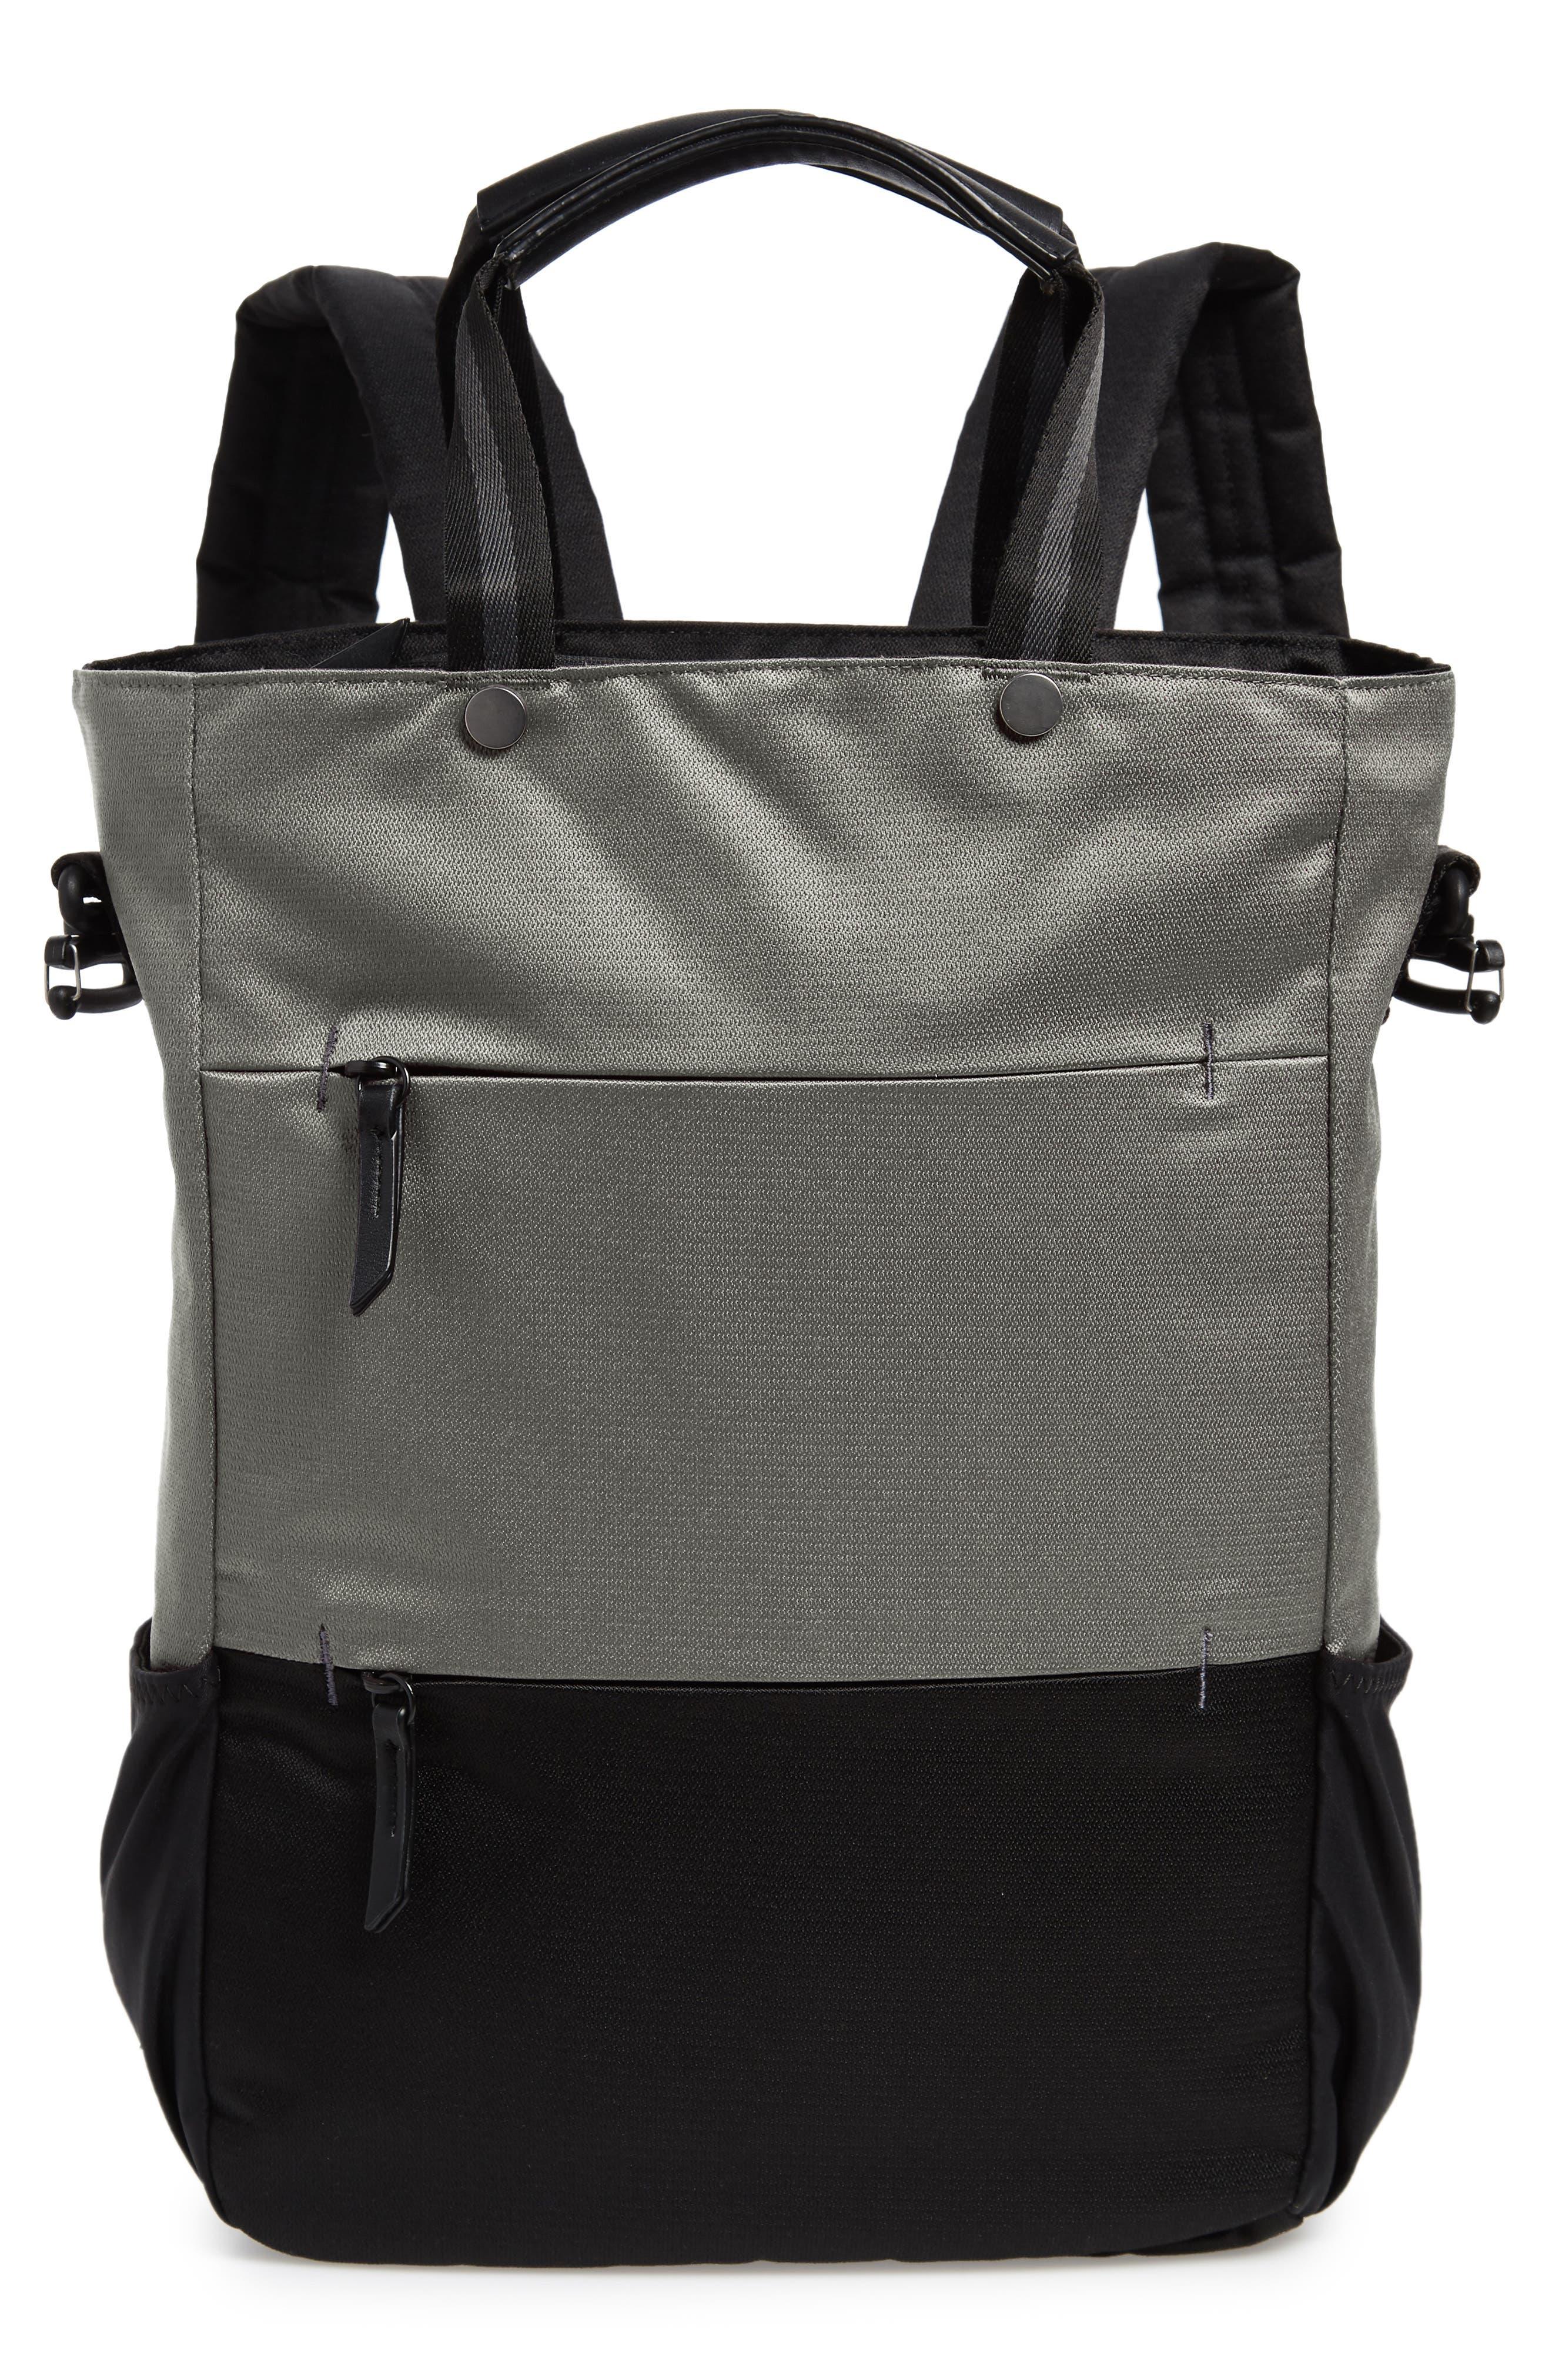 Camden RFID Convertible Backpack,                         Main,                         color, GREY FLINT/ BLACK